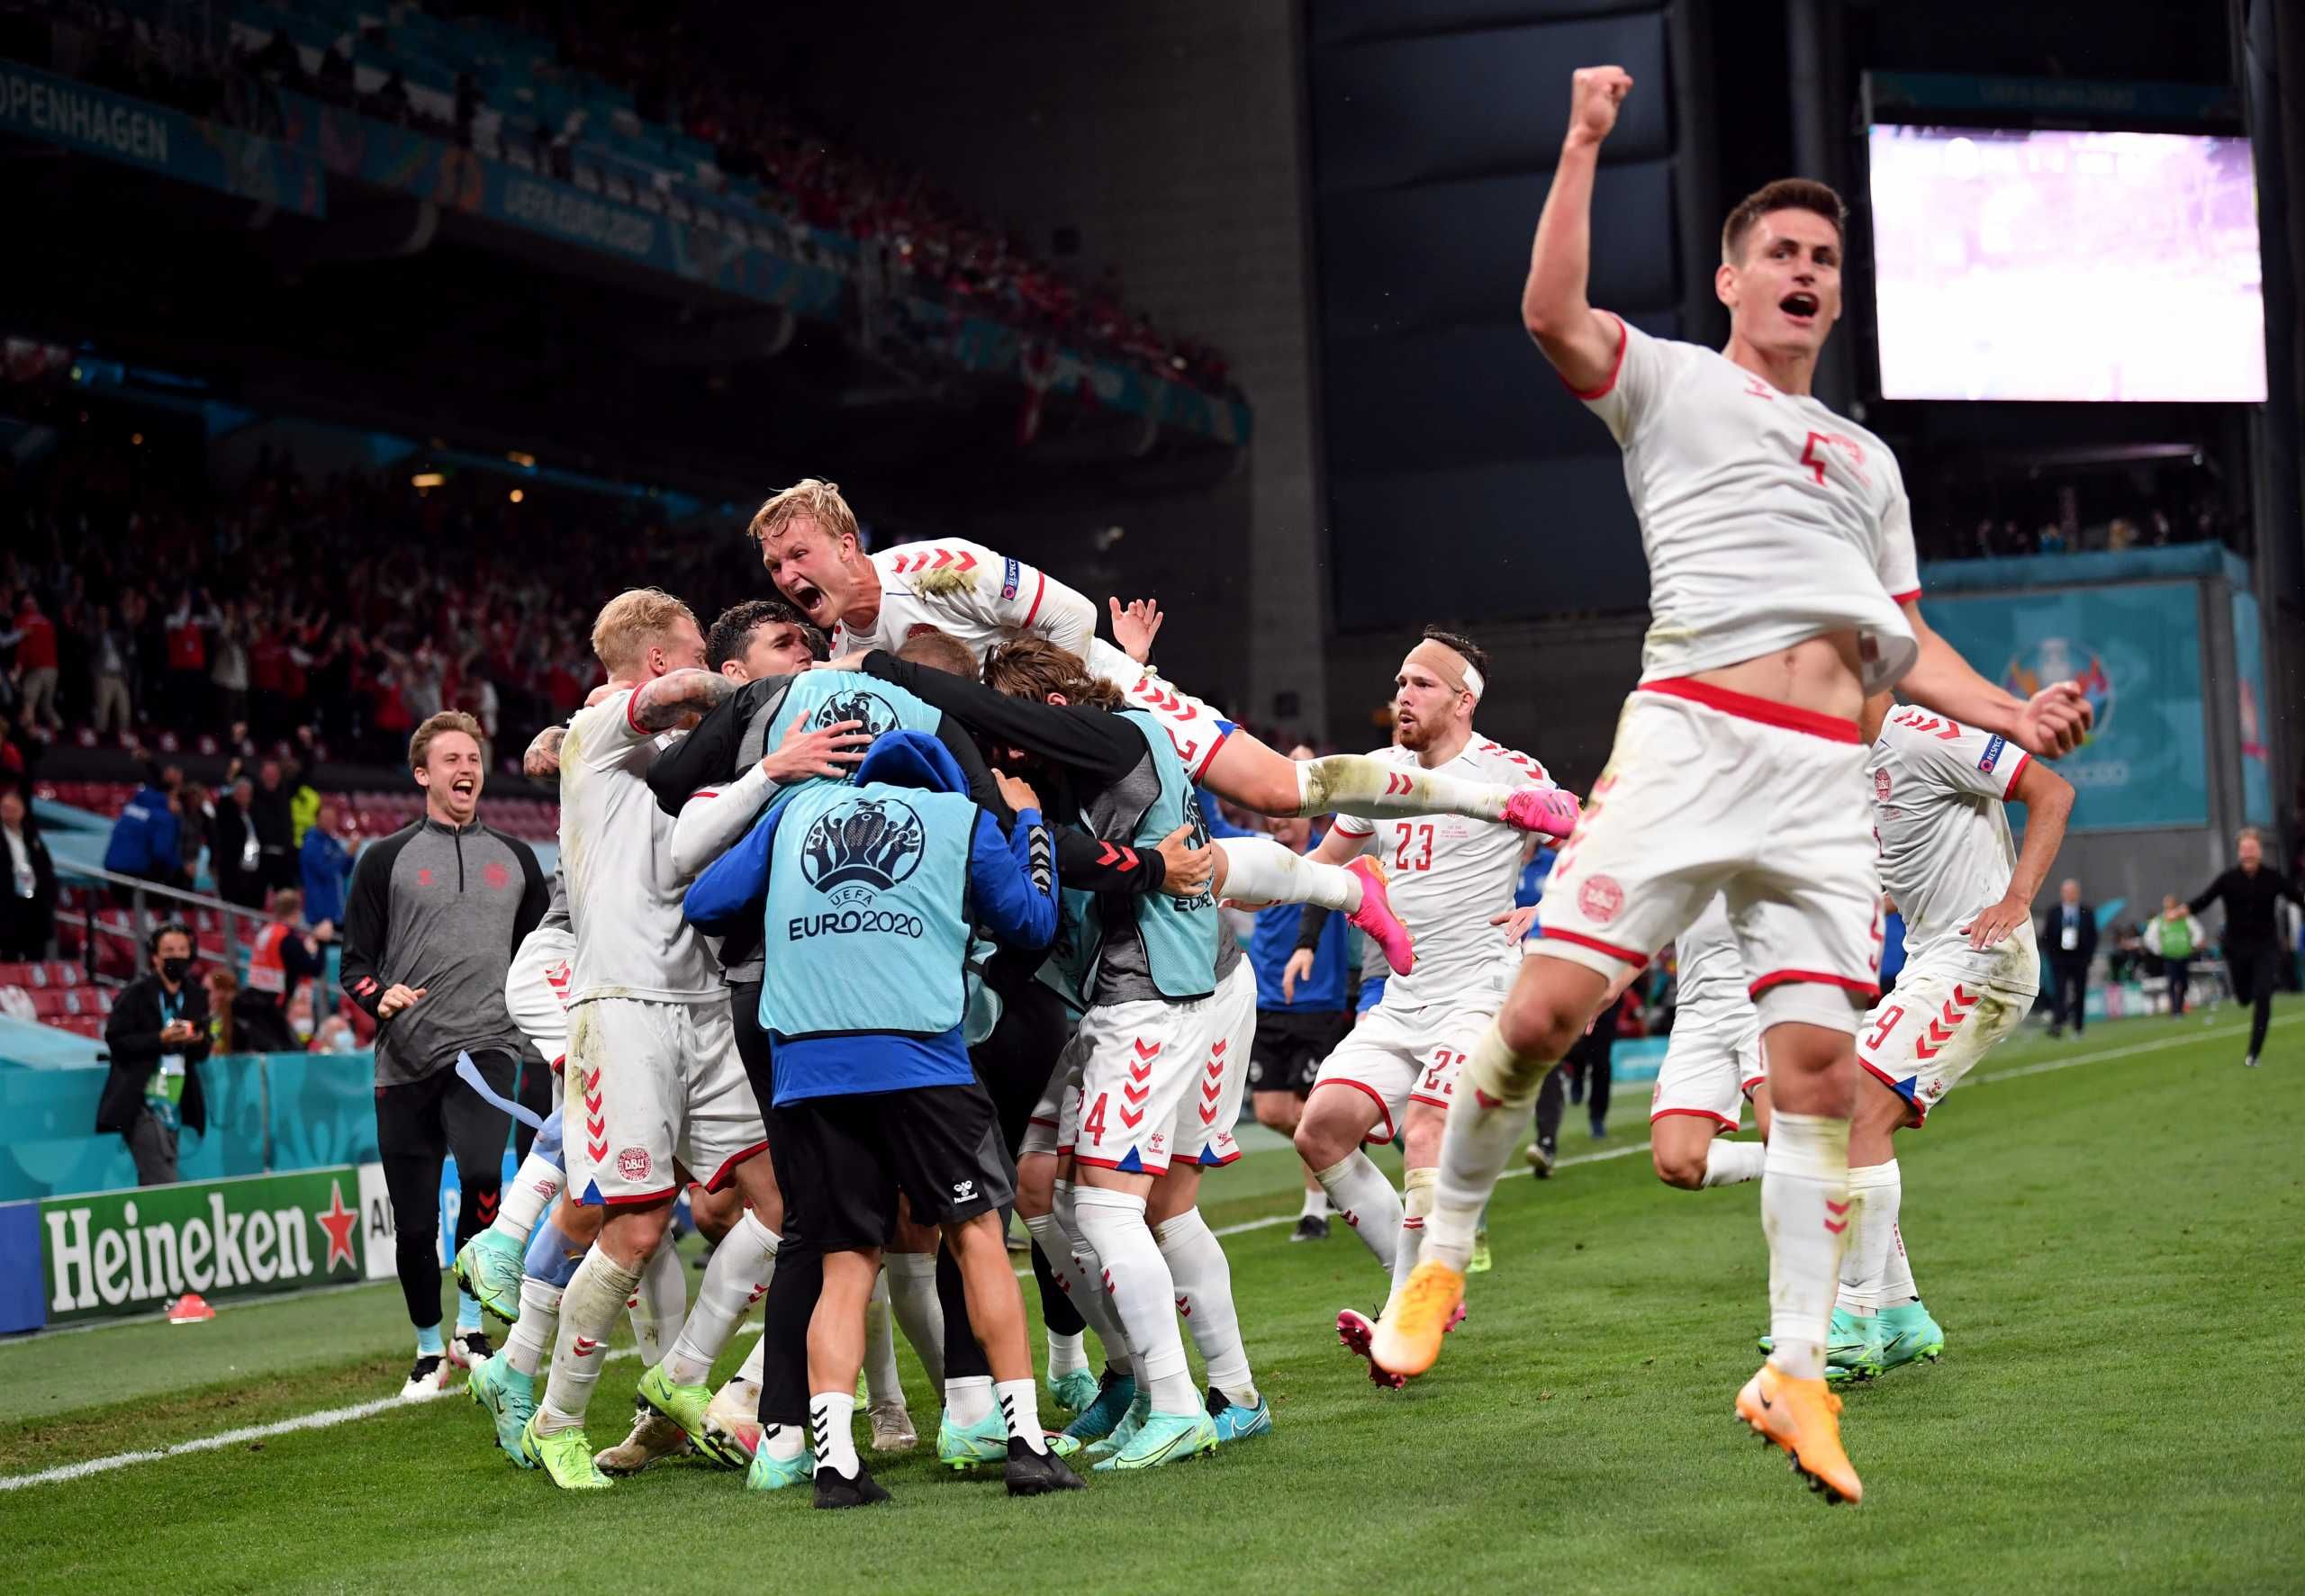 Euro 2020: «Μυθική» πρόκριση της Δανίας που έστειλε σπίτι της τη Ρωσία – 3Χ3 για το Βέλγιο